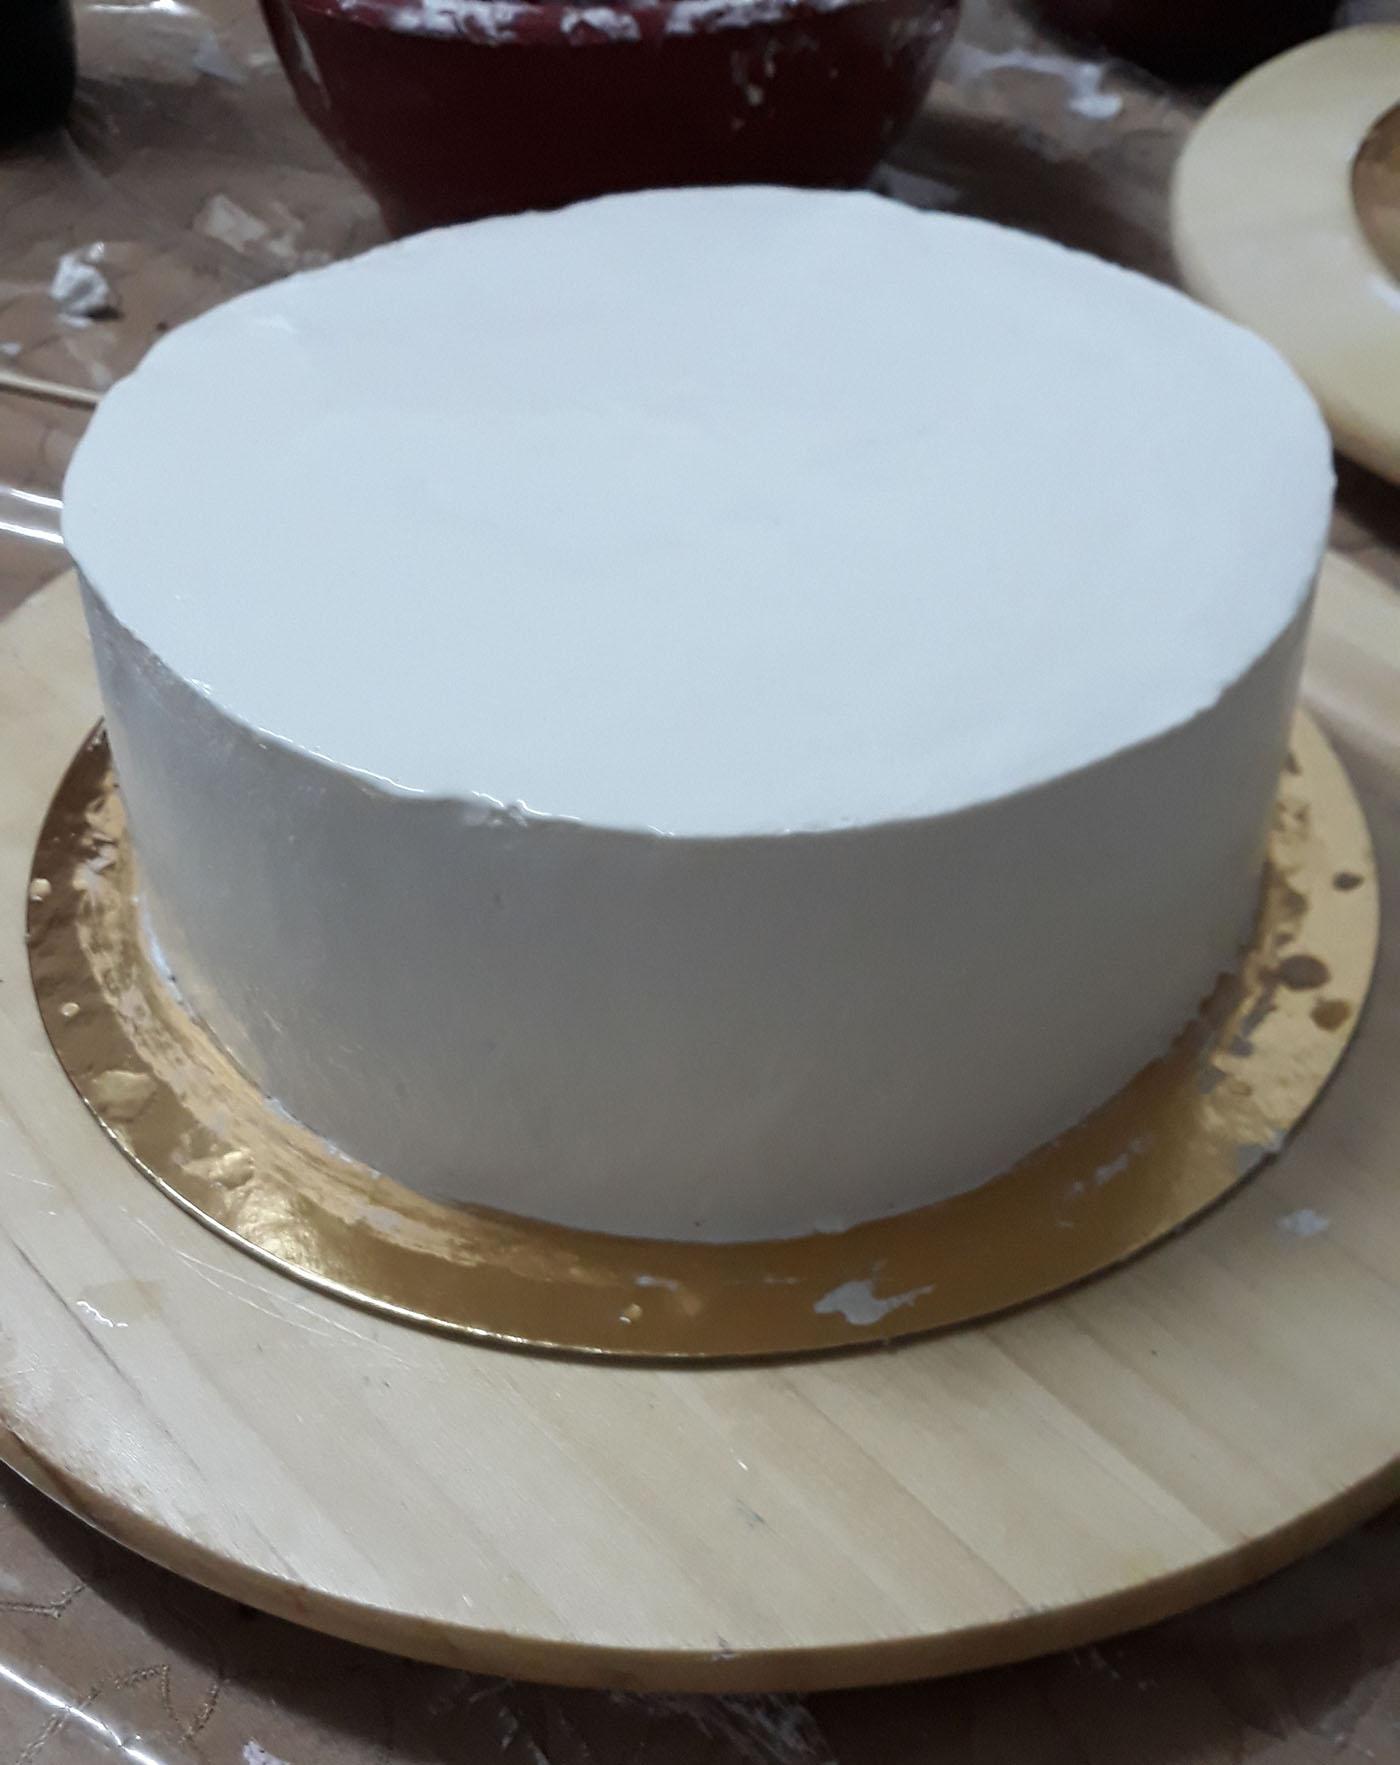 IMG 20190729 WA0027 - עוגת זילוף